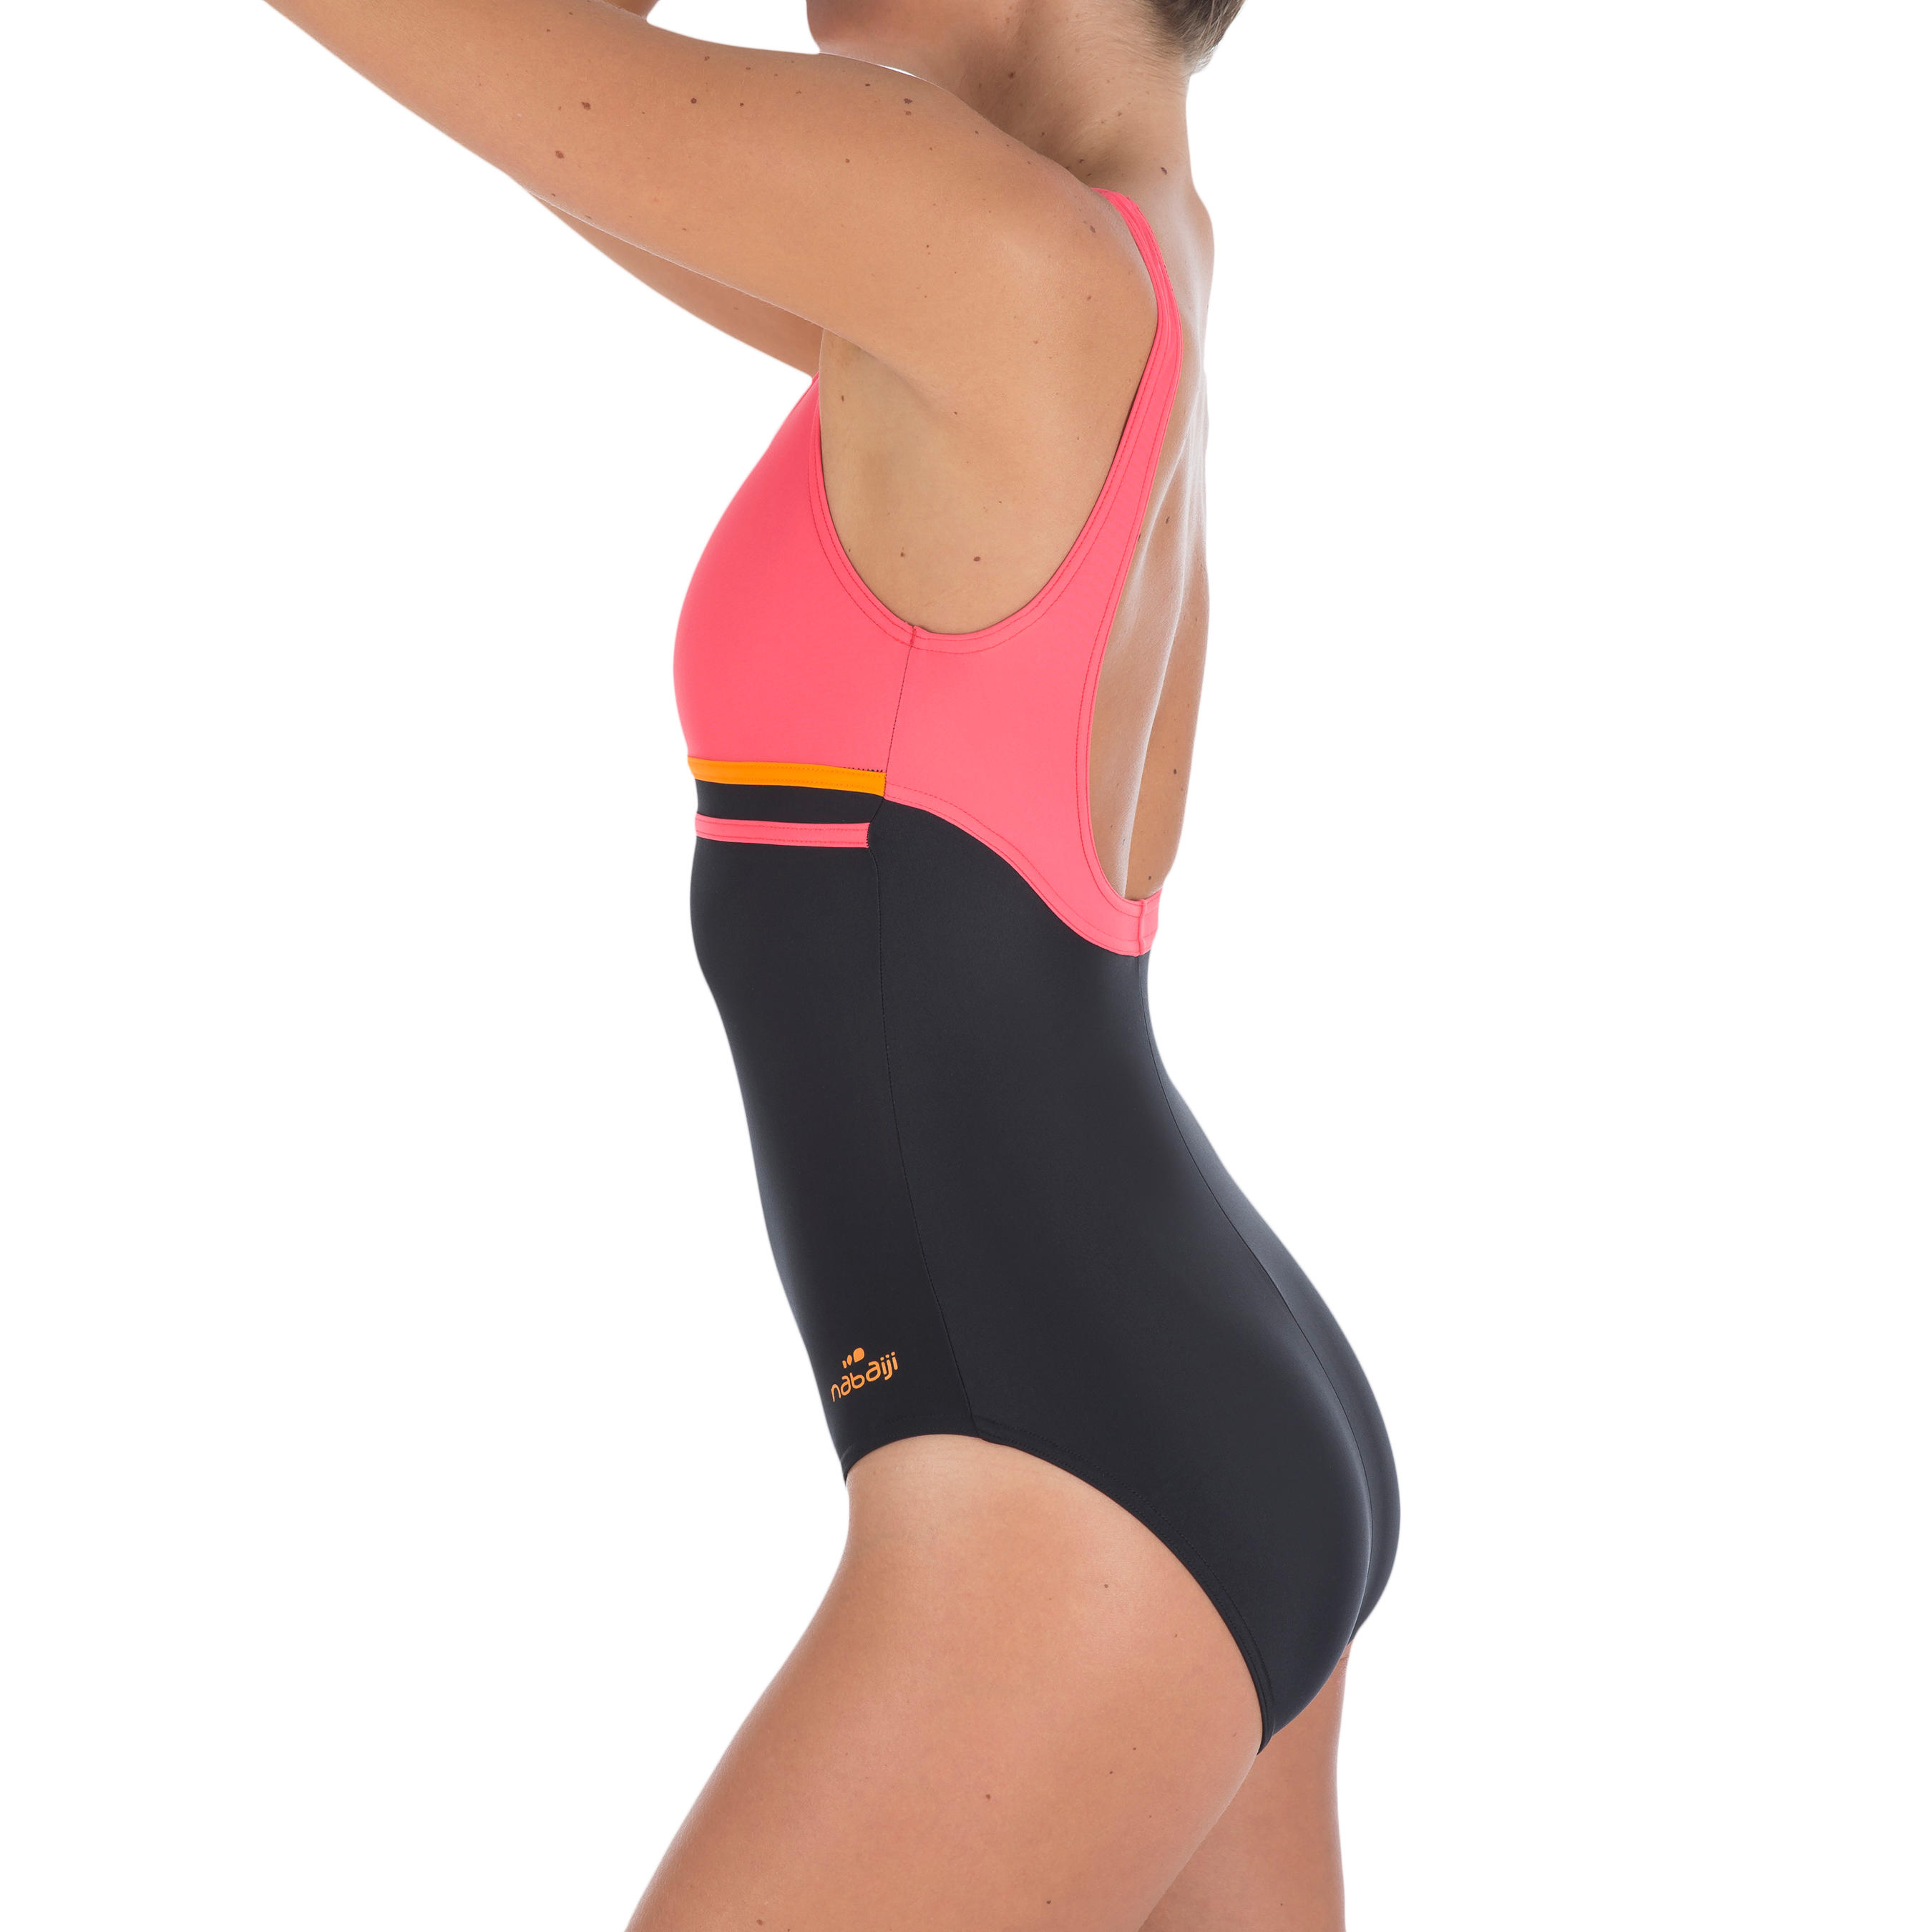 Loran Women's One-Piece Swimsuit - Black Coral